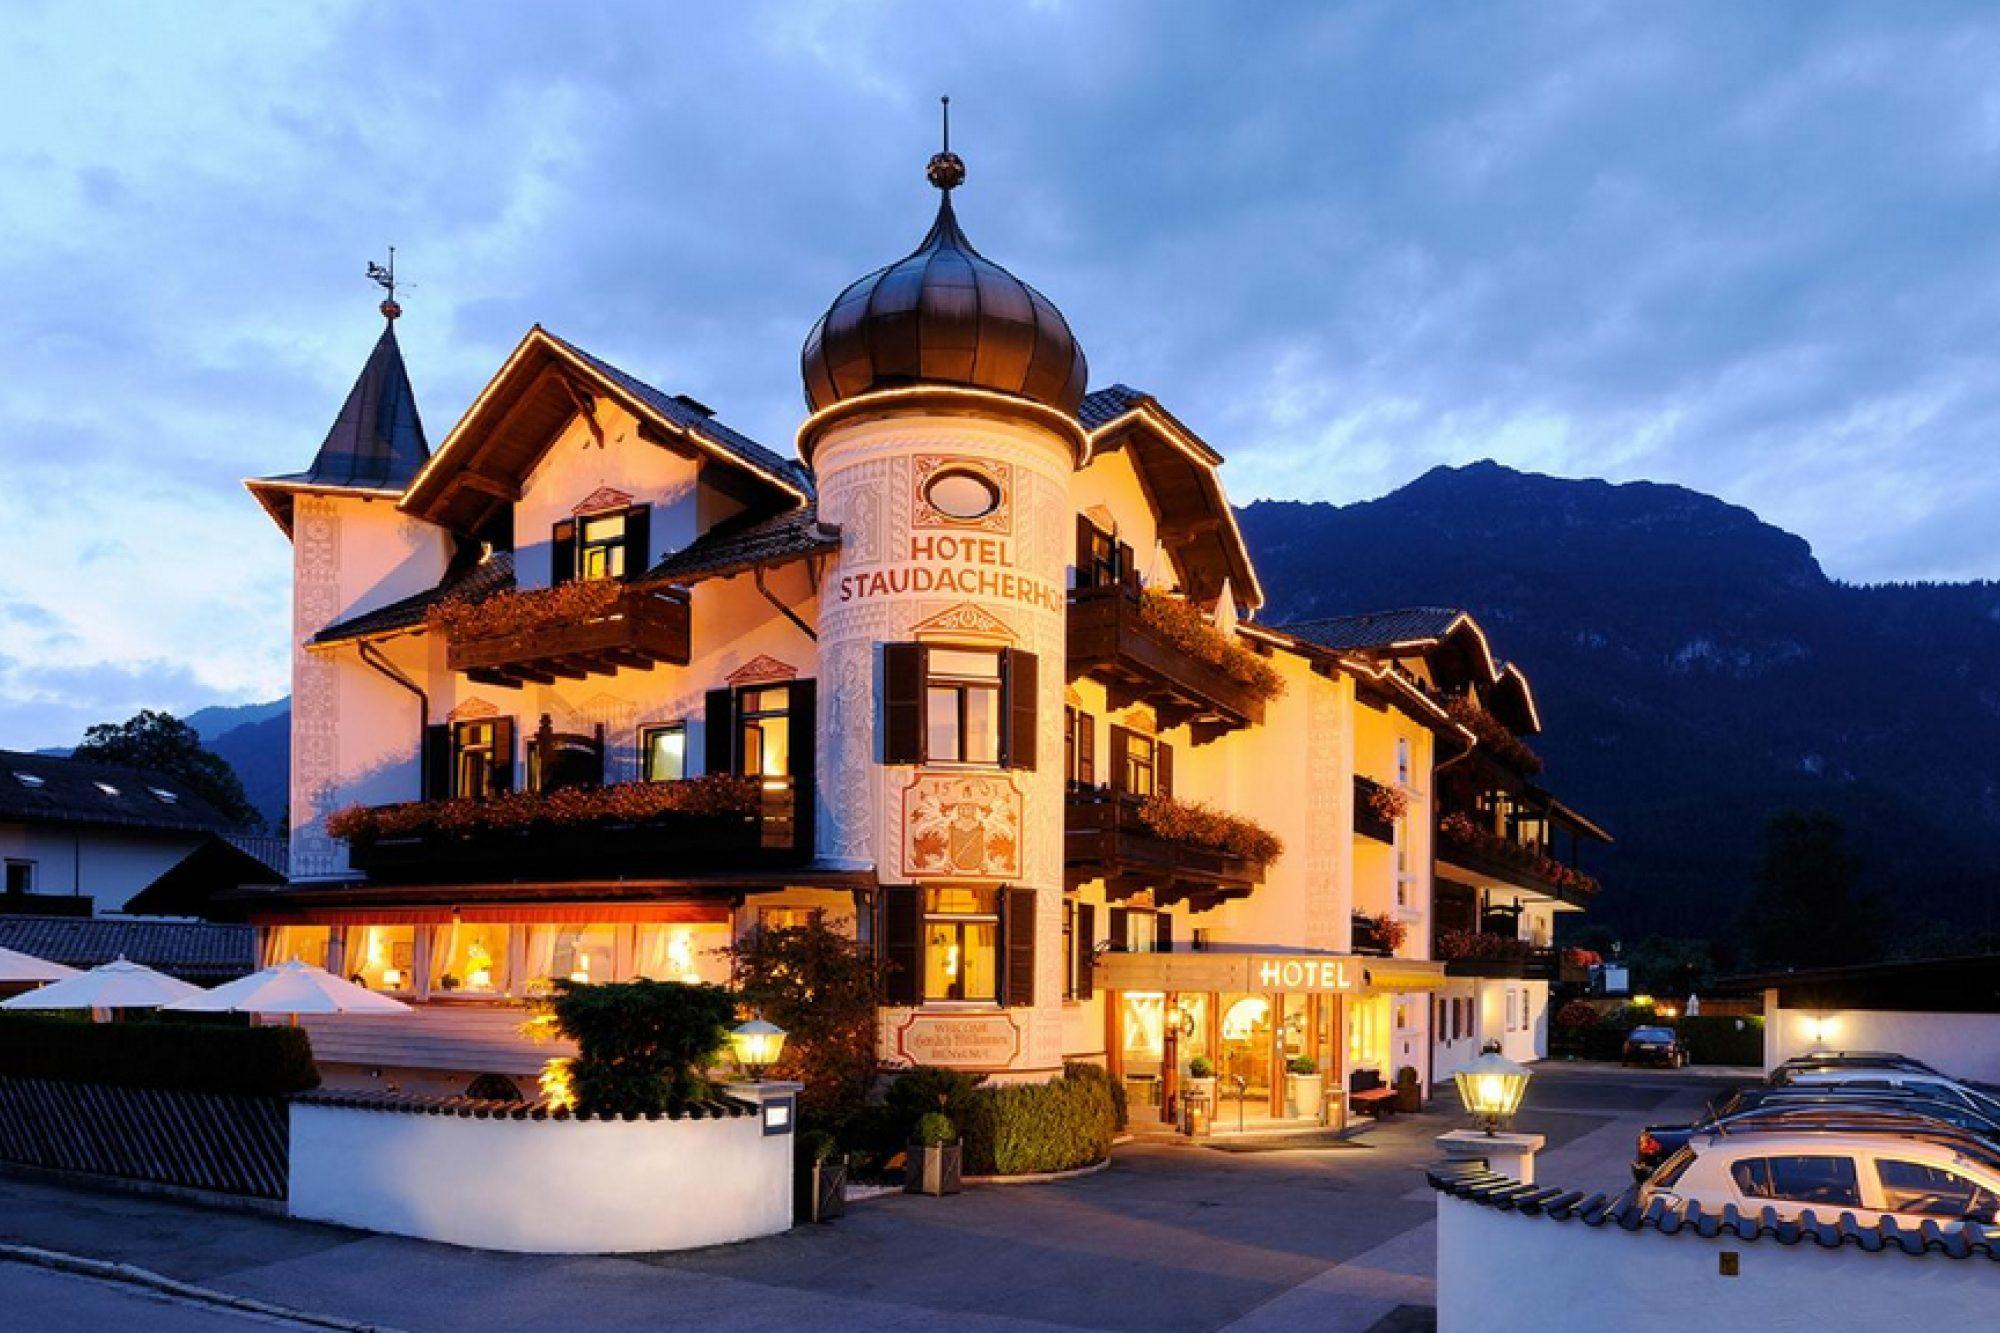 Hotel_Staudacherhof.jpg